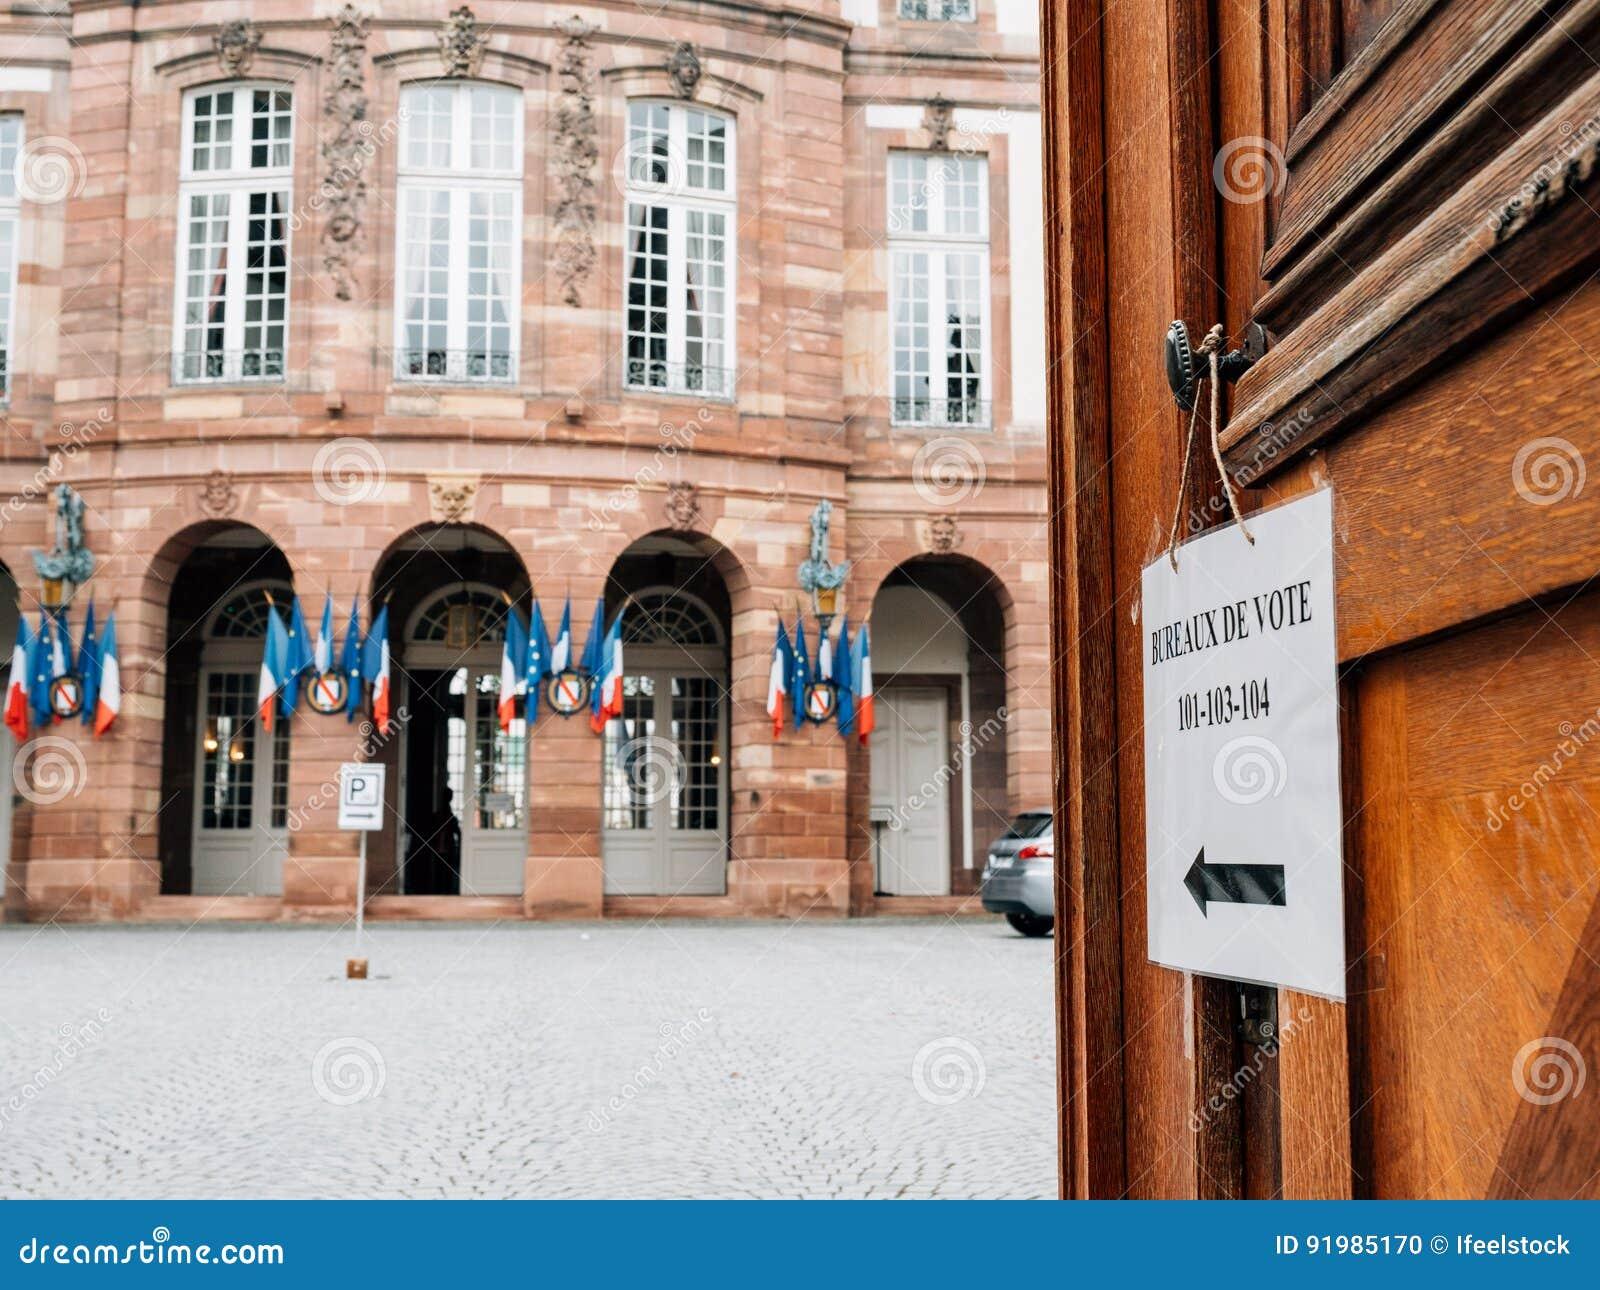 Courbe moderne bureau bureau pour hôtel bureau accueil buy